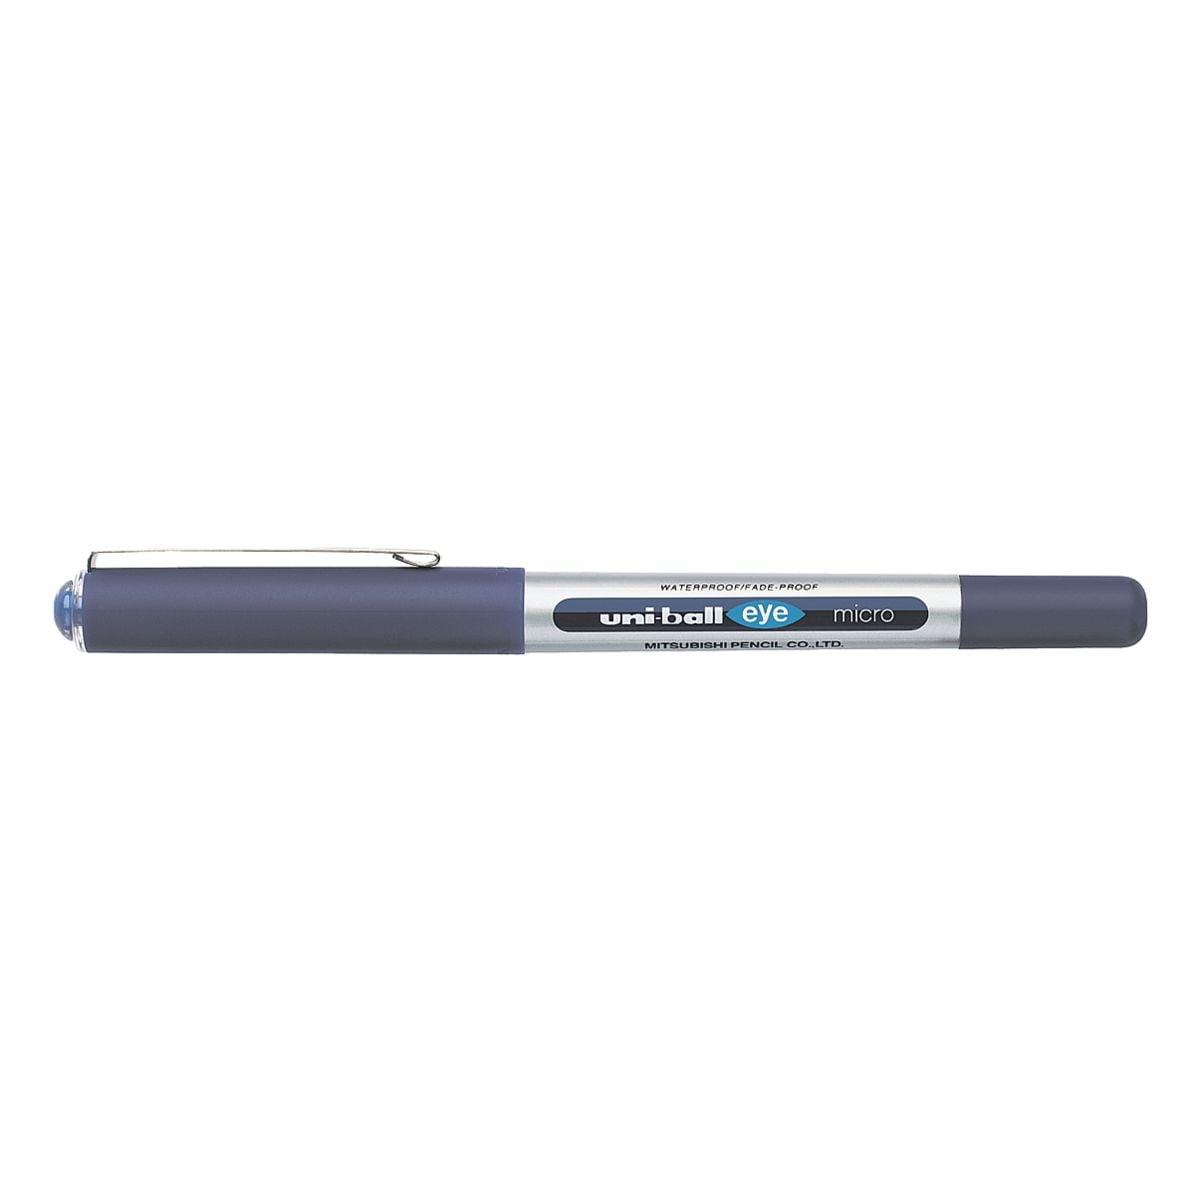 Tintenroller uni-ball uni-ball eye micro